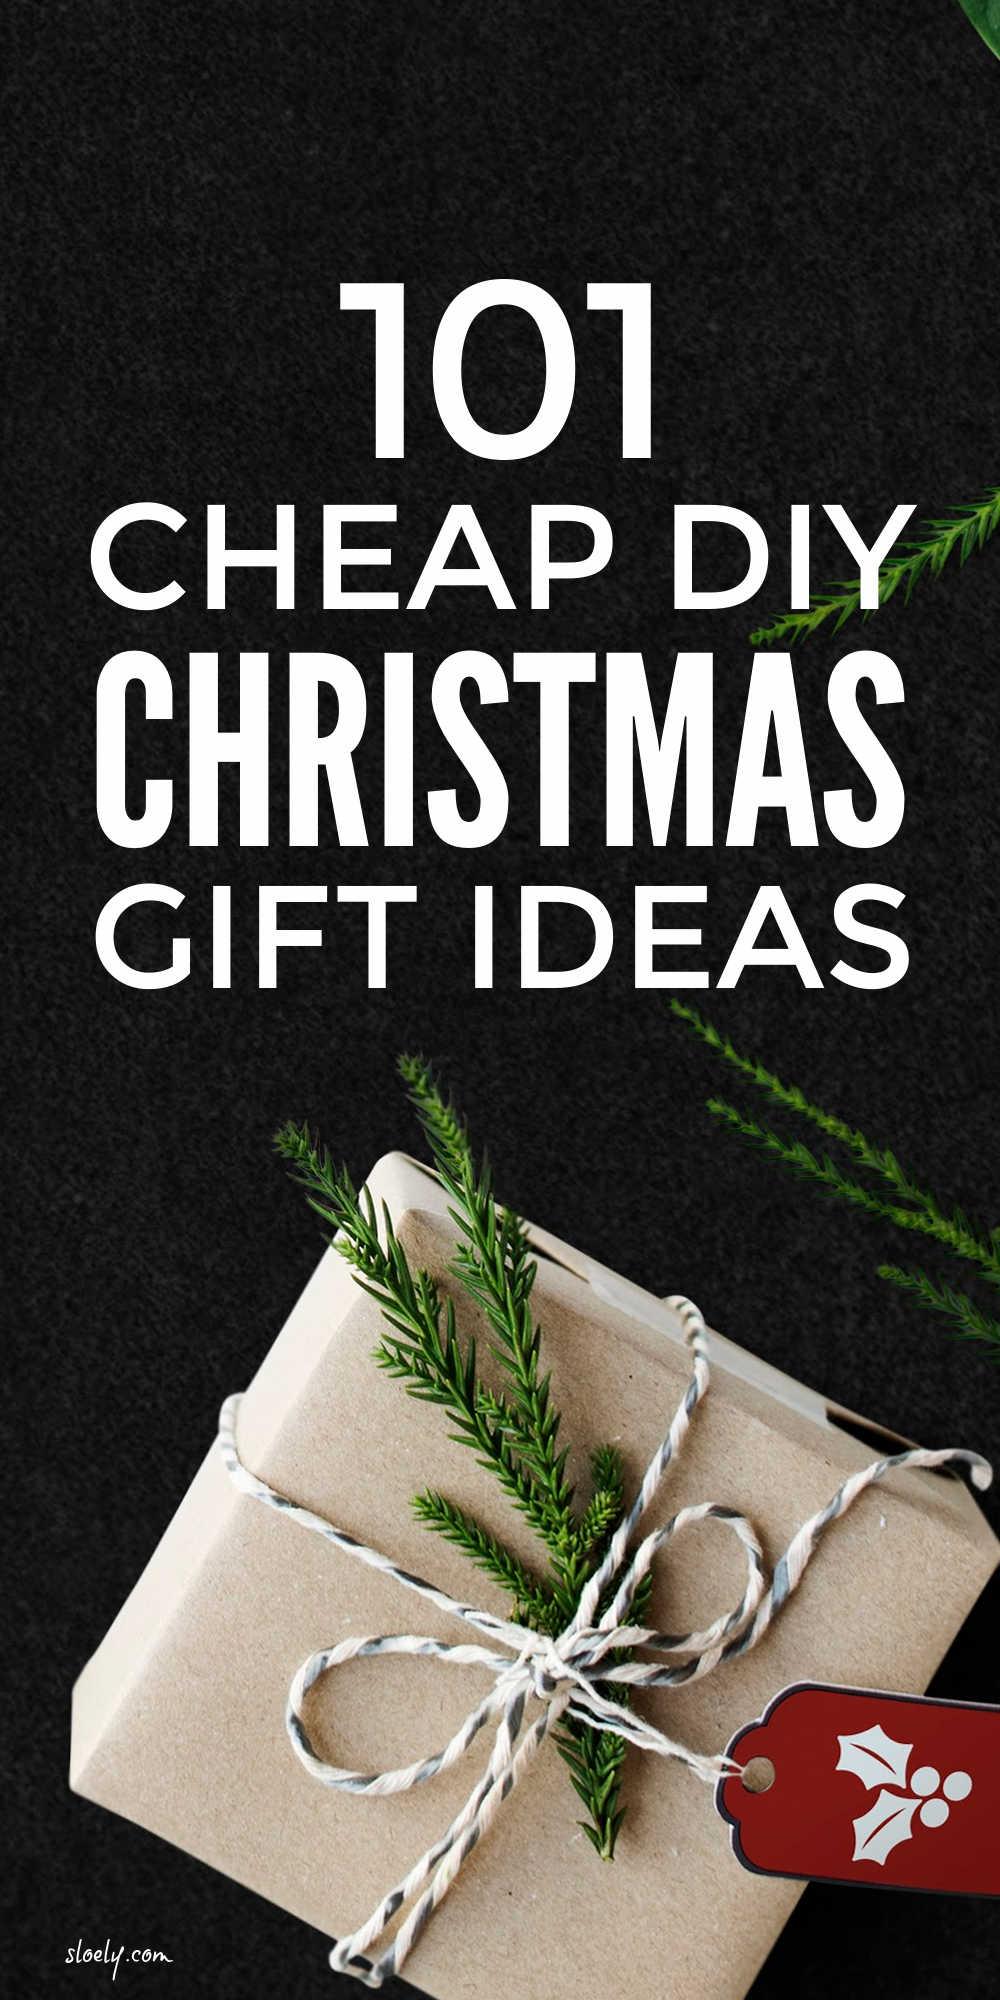 Cheap DIY Christmas Gift Ideas